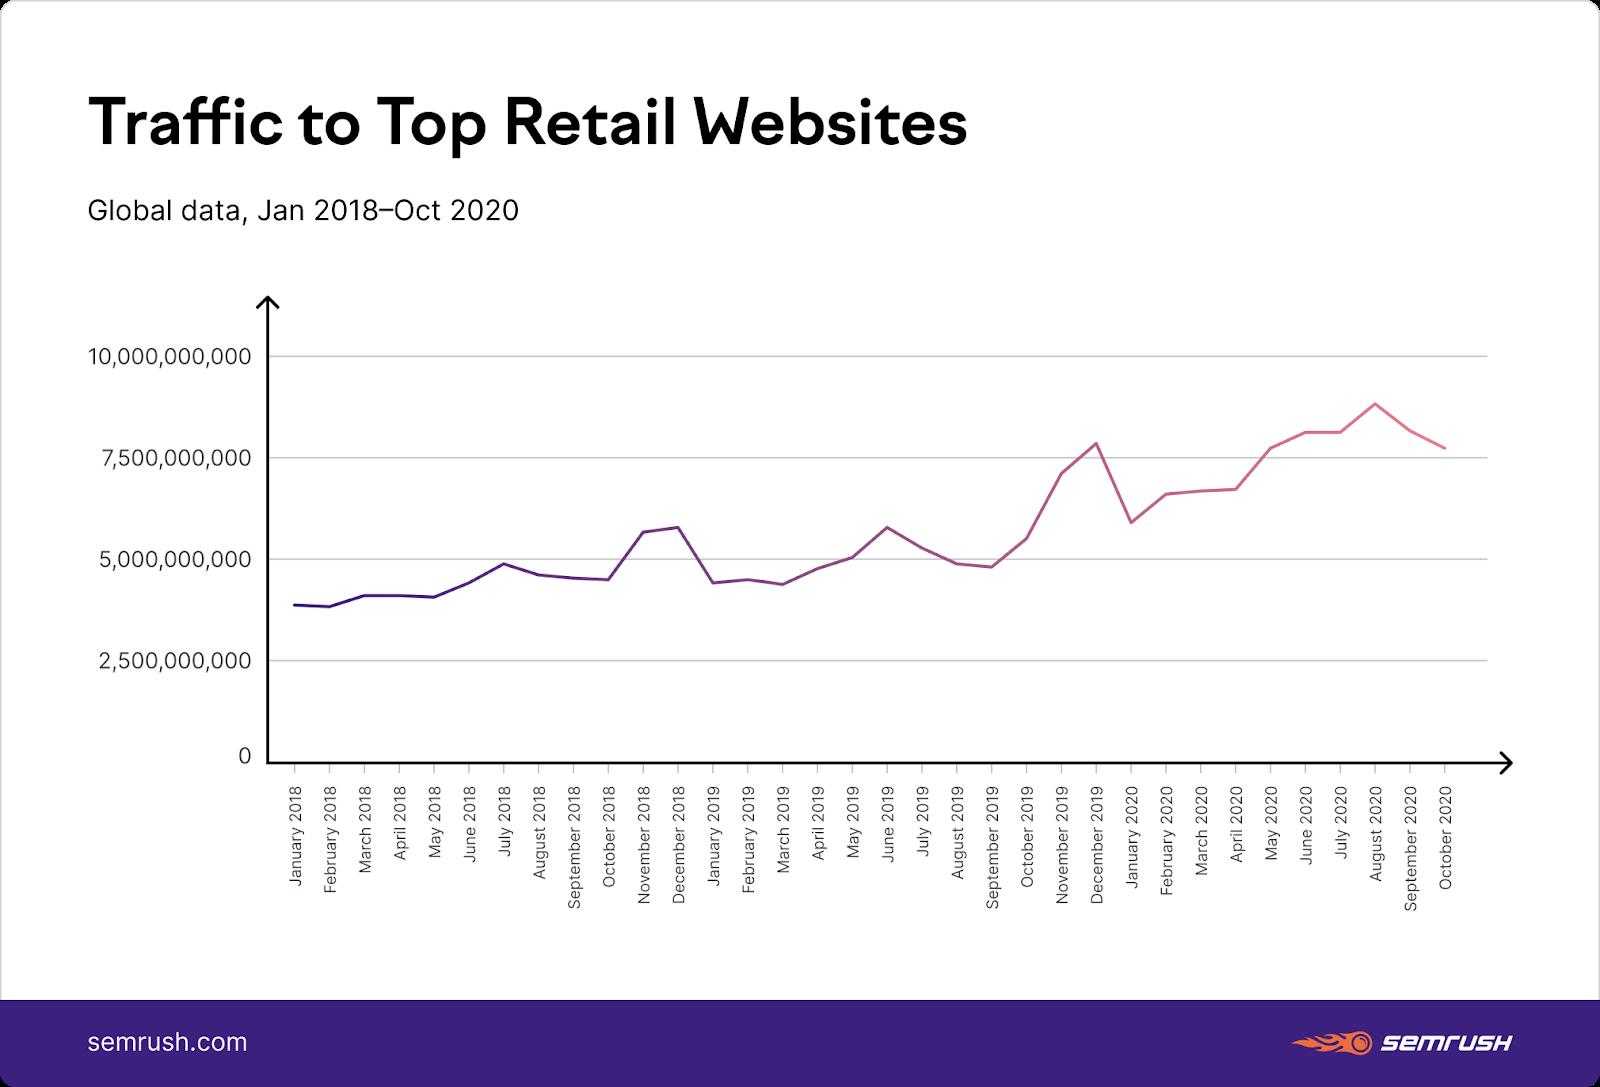 Growing traffic to top retailer websites